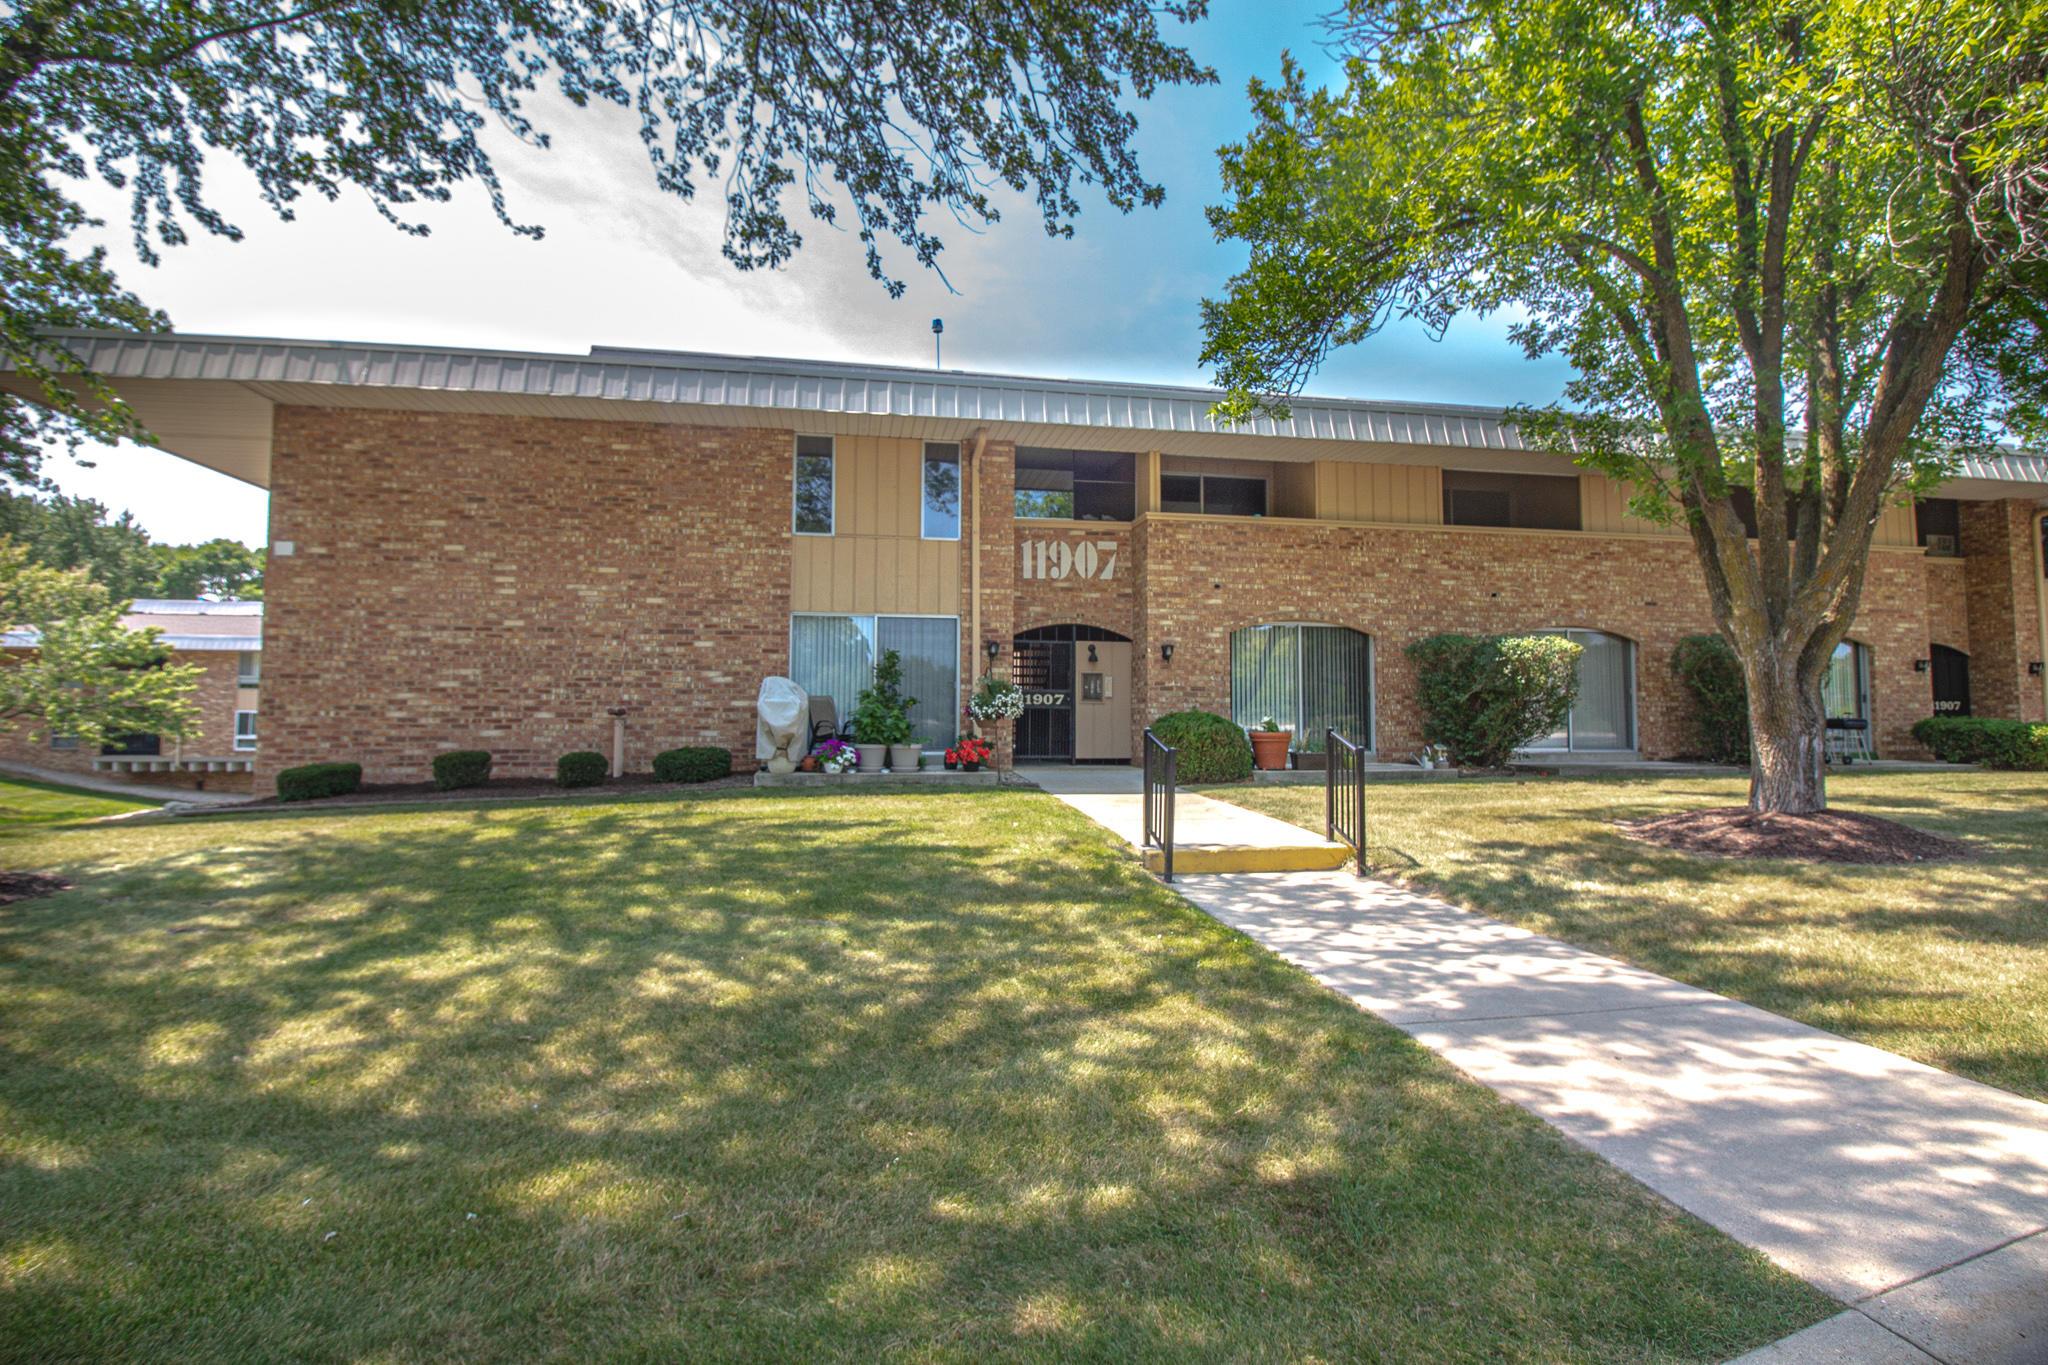 11907 Appleton Ave, Milwaukee, Wisconsin 53224, 2 Bedrooms Bedrooms, ,1 BathroomBathrooms,Condominiums,For Sale,Appleton Ave,1,1754883